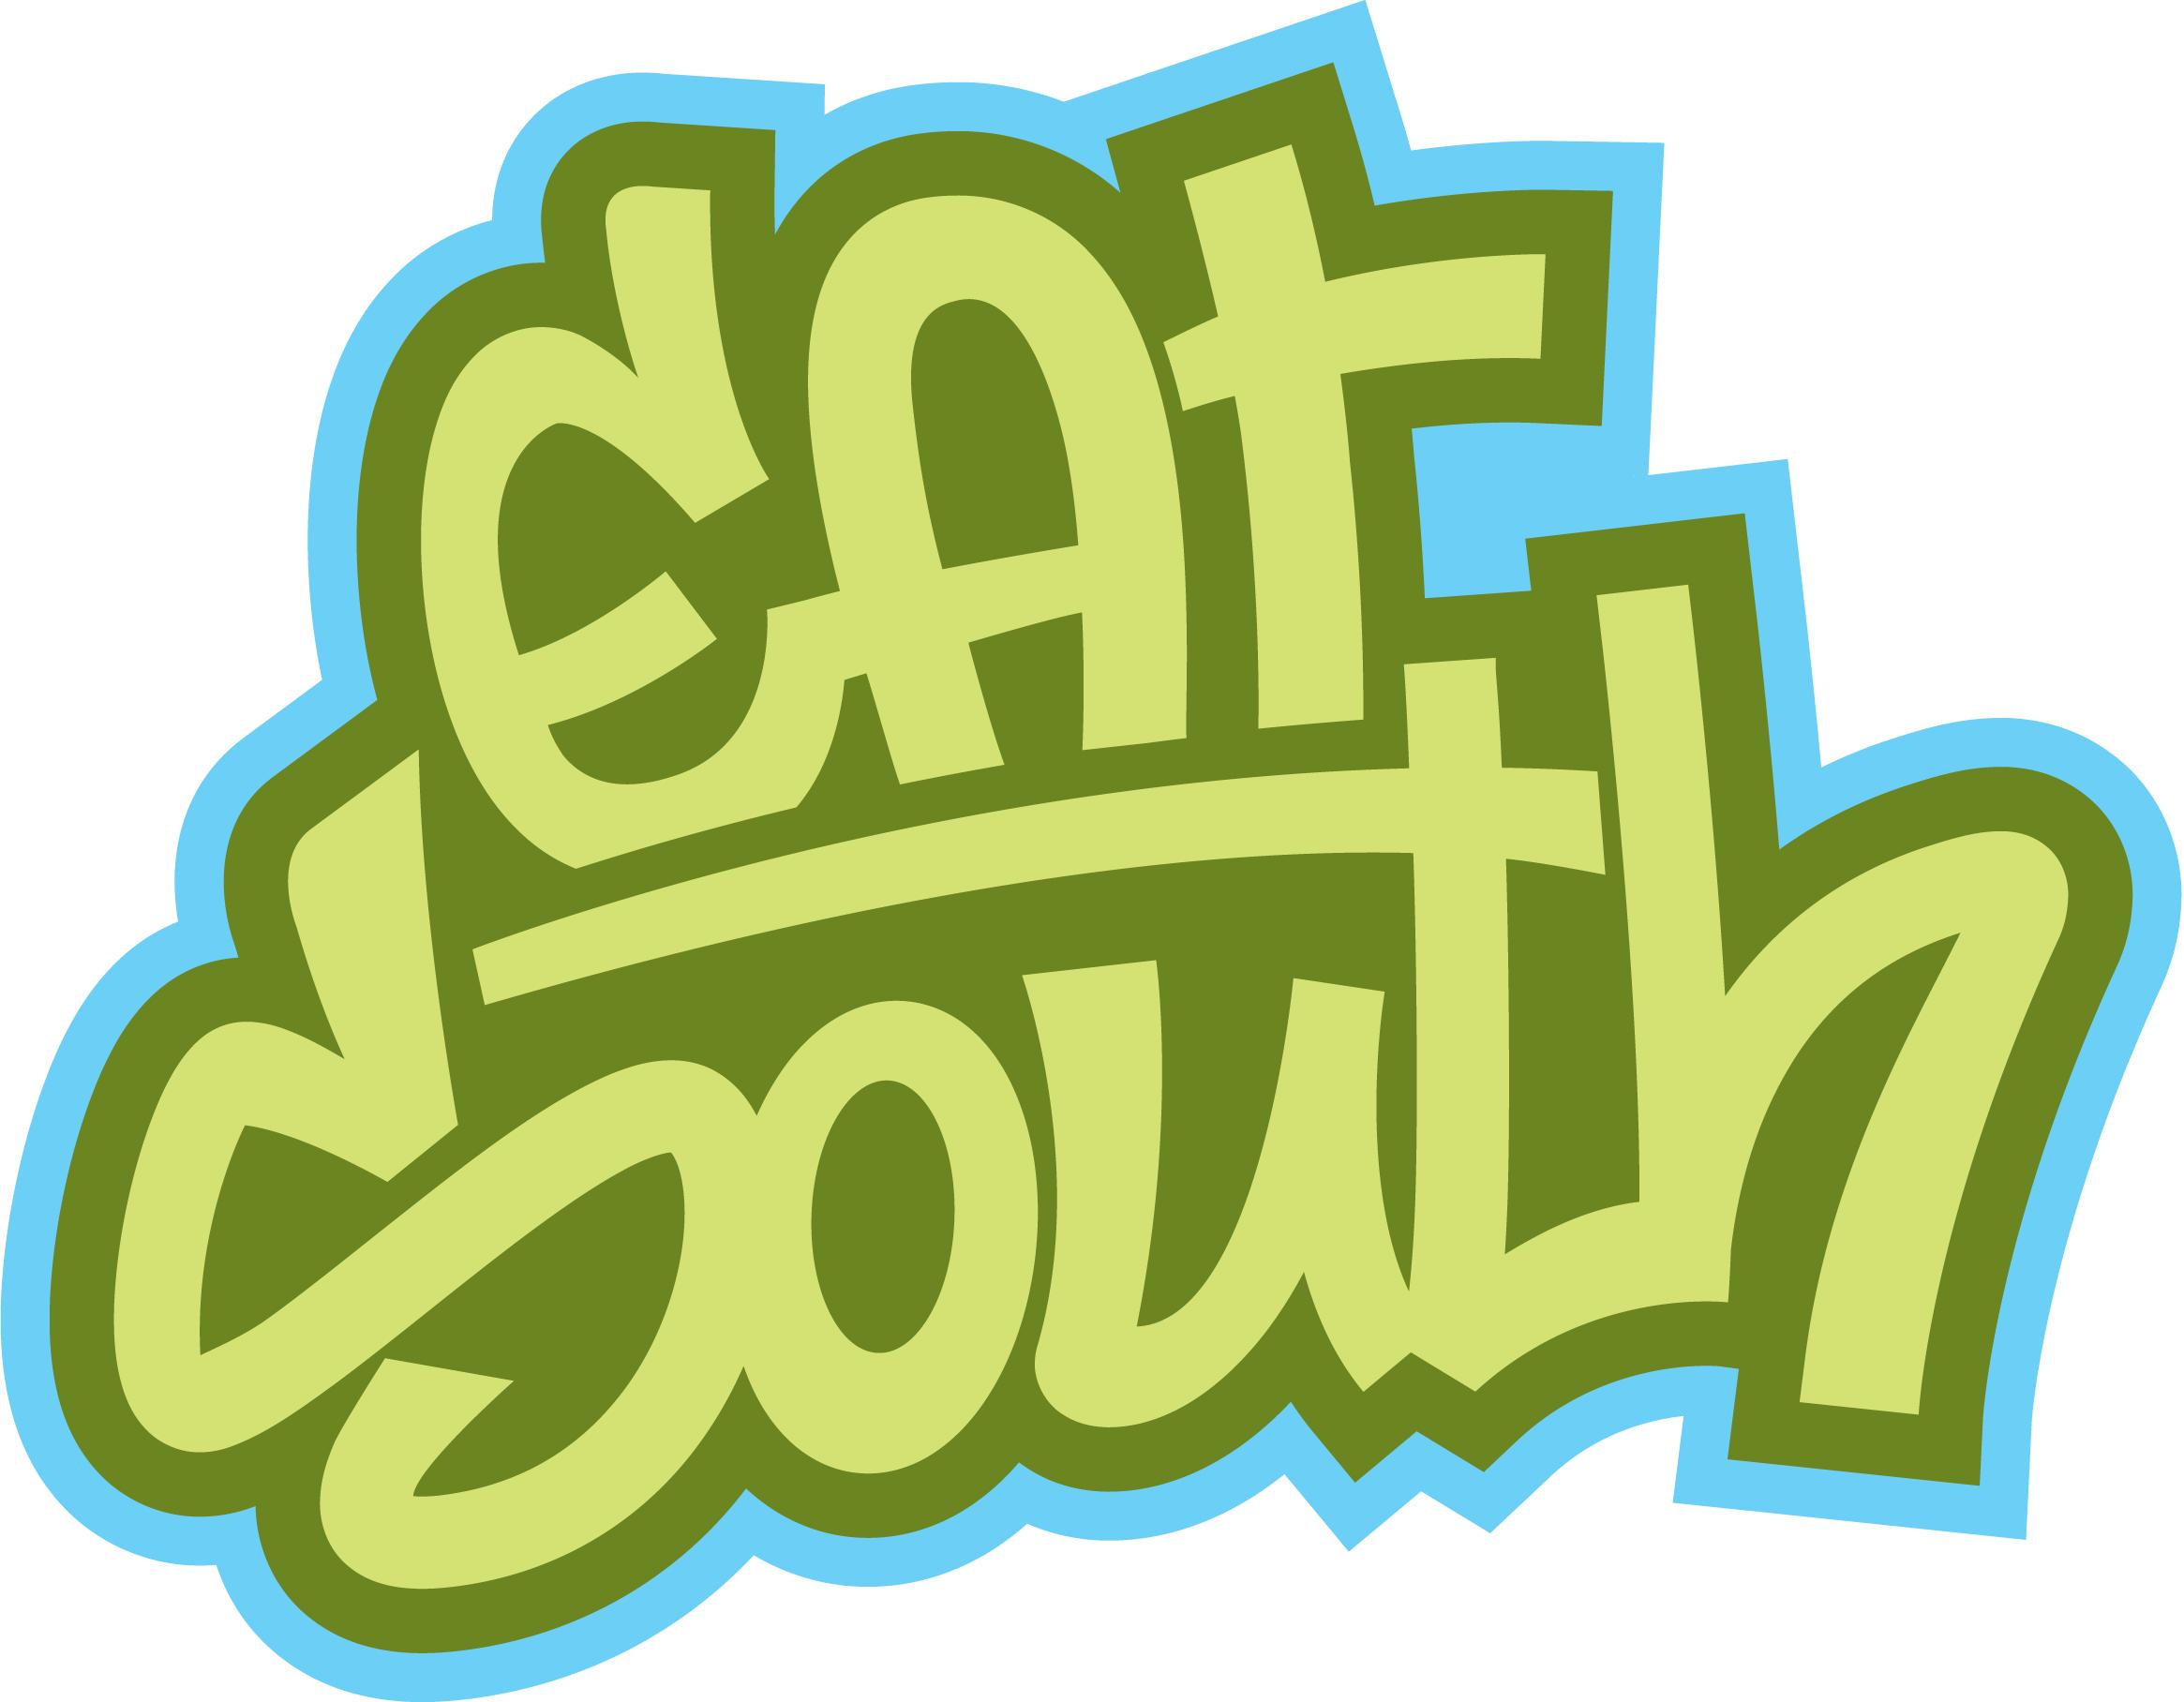 Eat_South_GgB.jpg